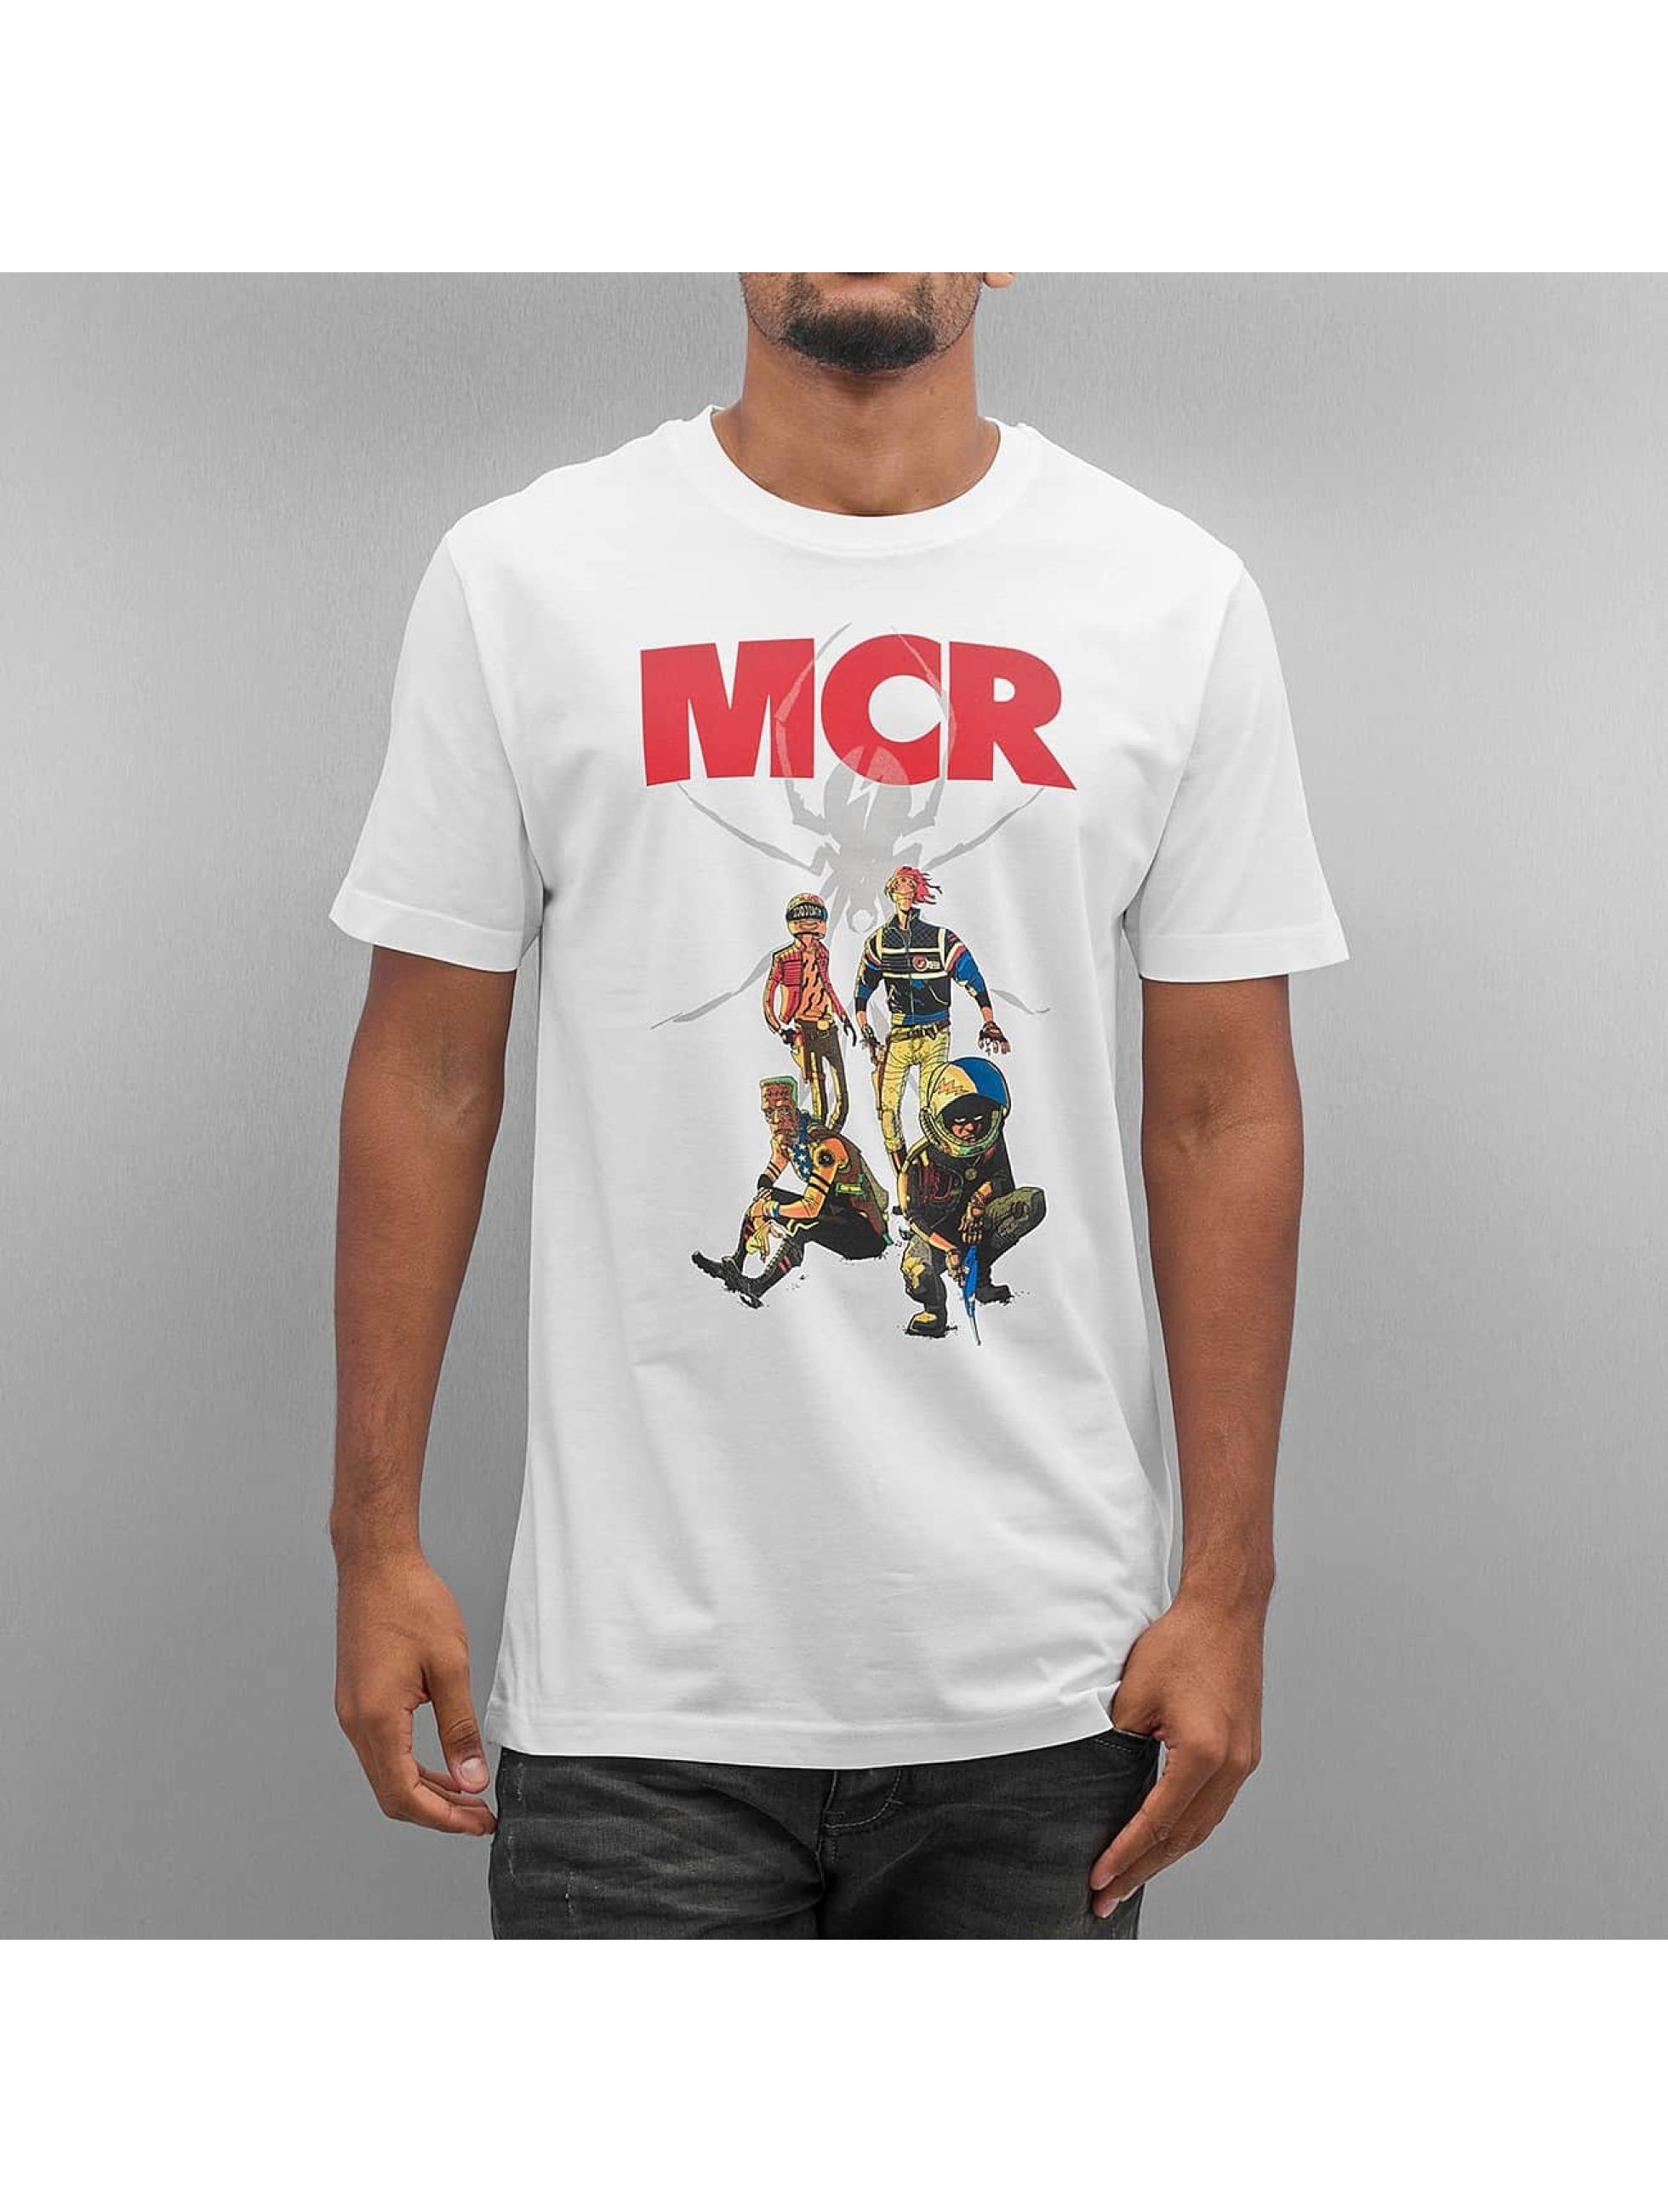 Mister Tee T-skjorter MY Chemical Romance Killjoys Pinup hvit